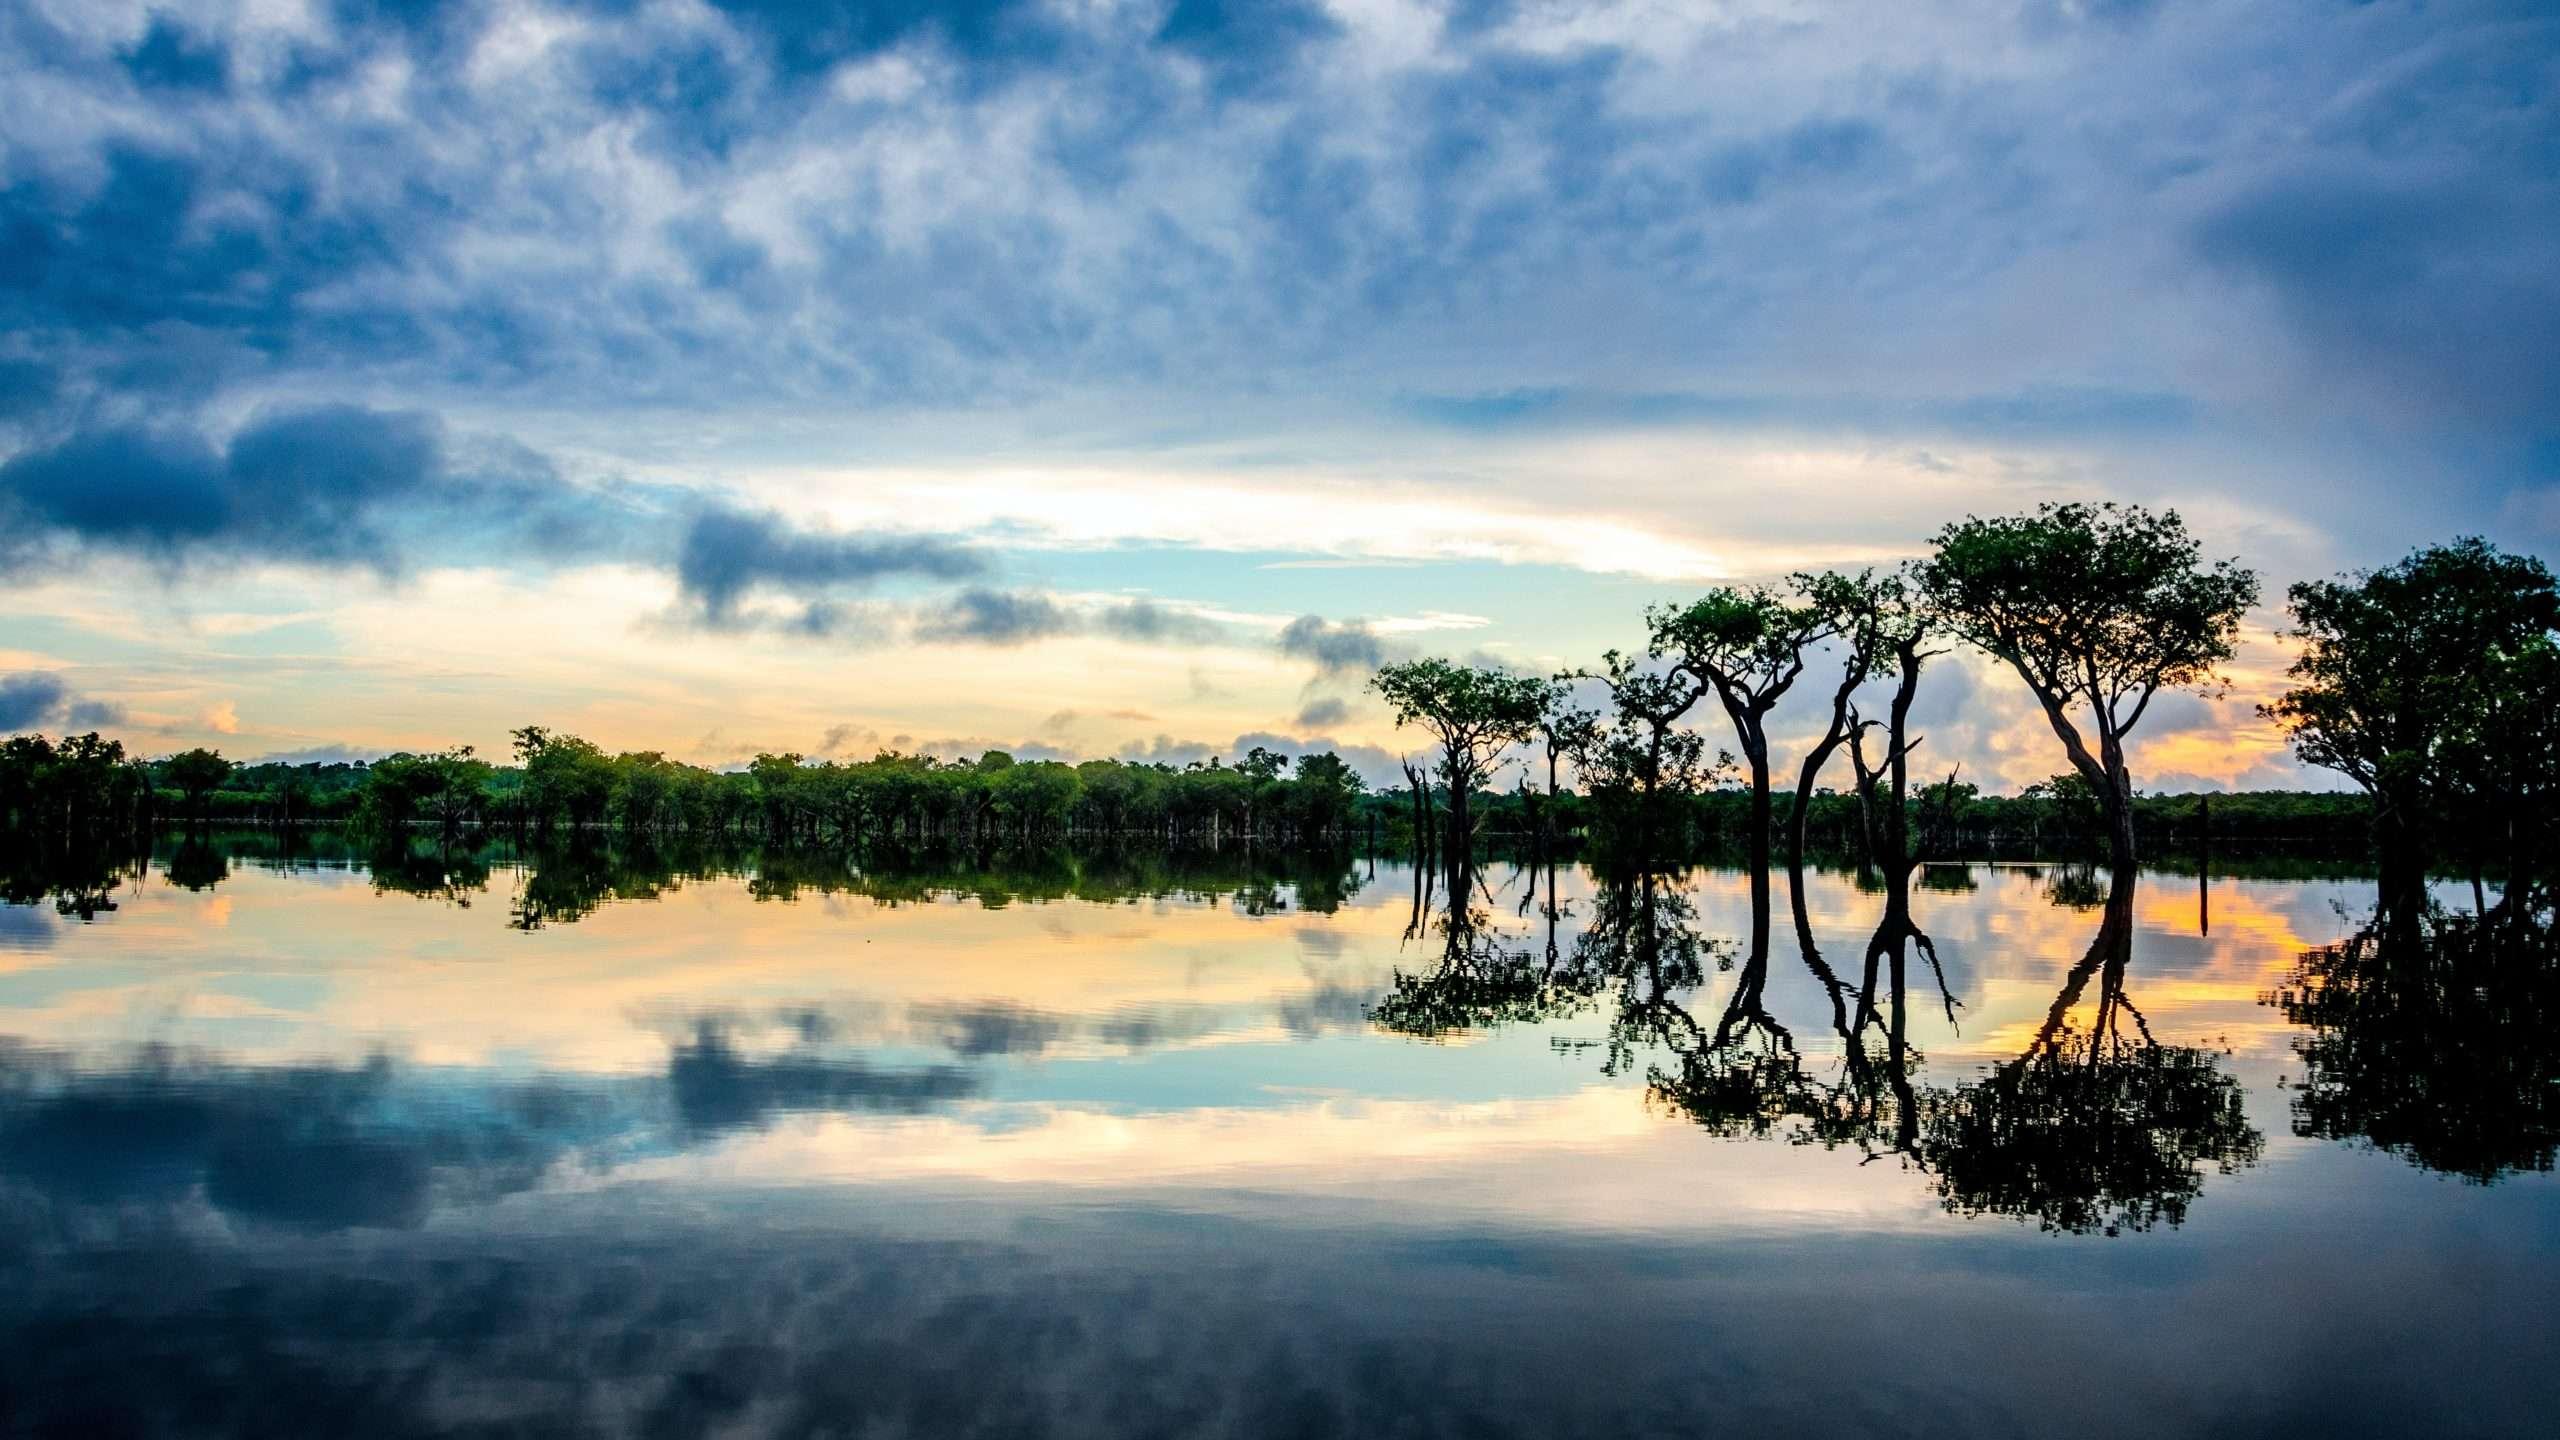 Amazzonia. Photo by Sébastien Goldberg